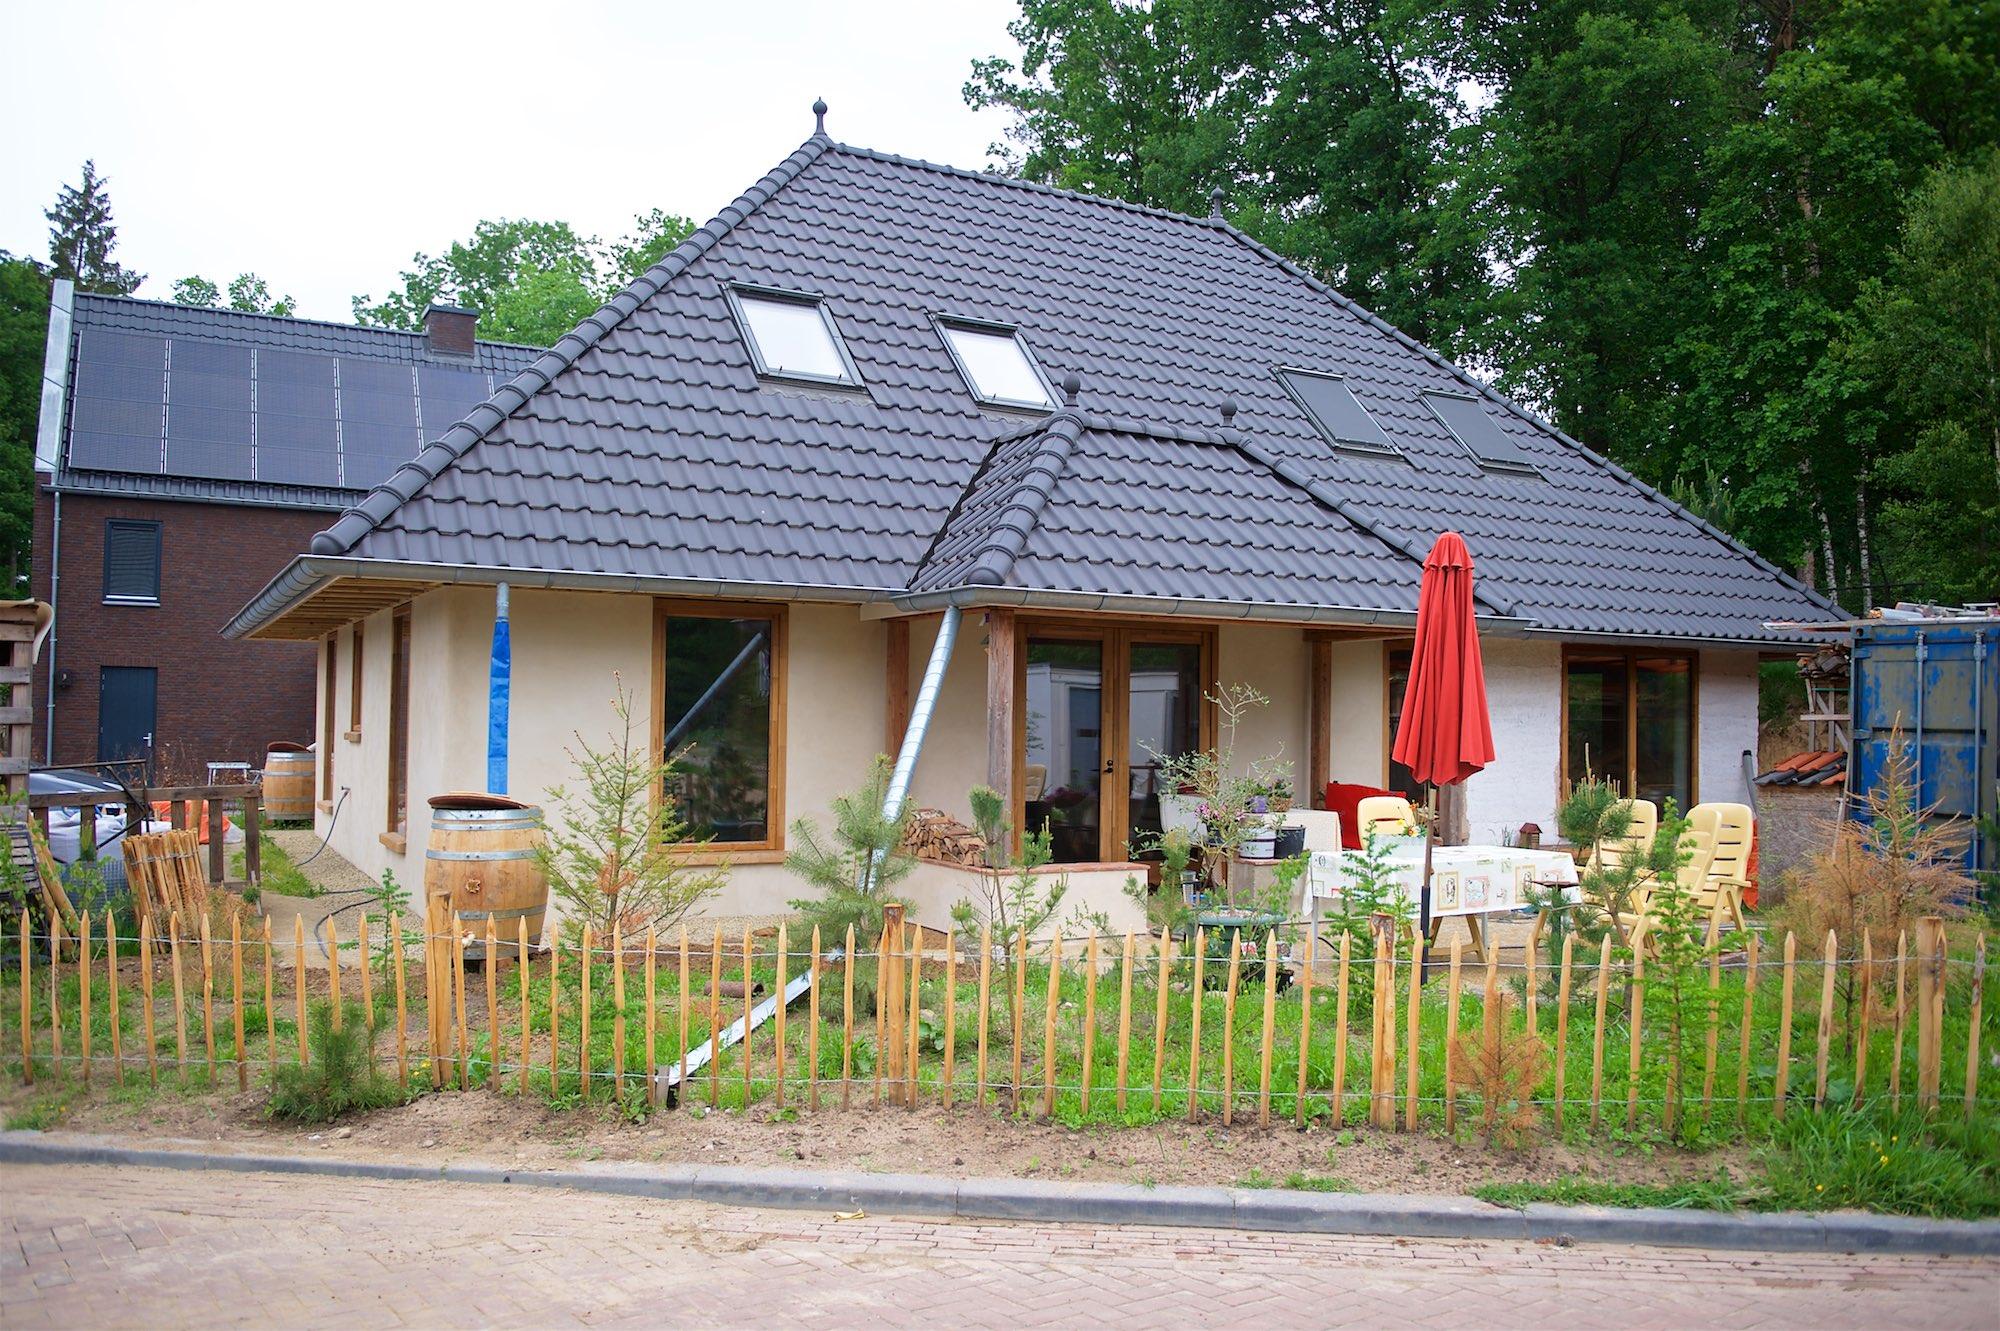 Passive House Hemp Shuttered Hempbuild Sustainable Products Project.jpg